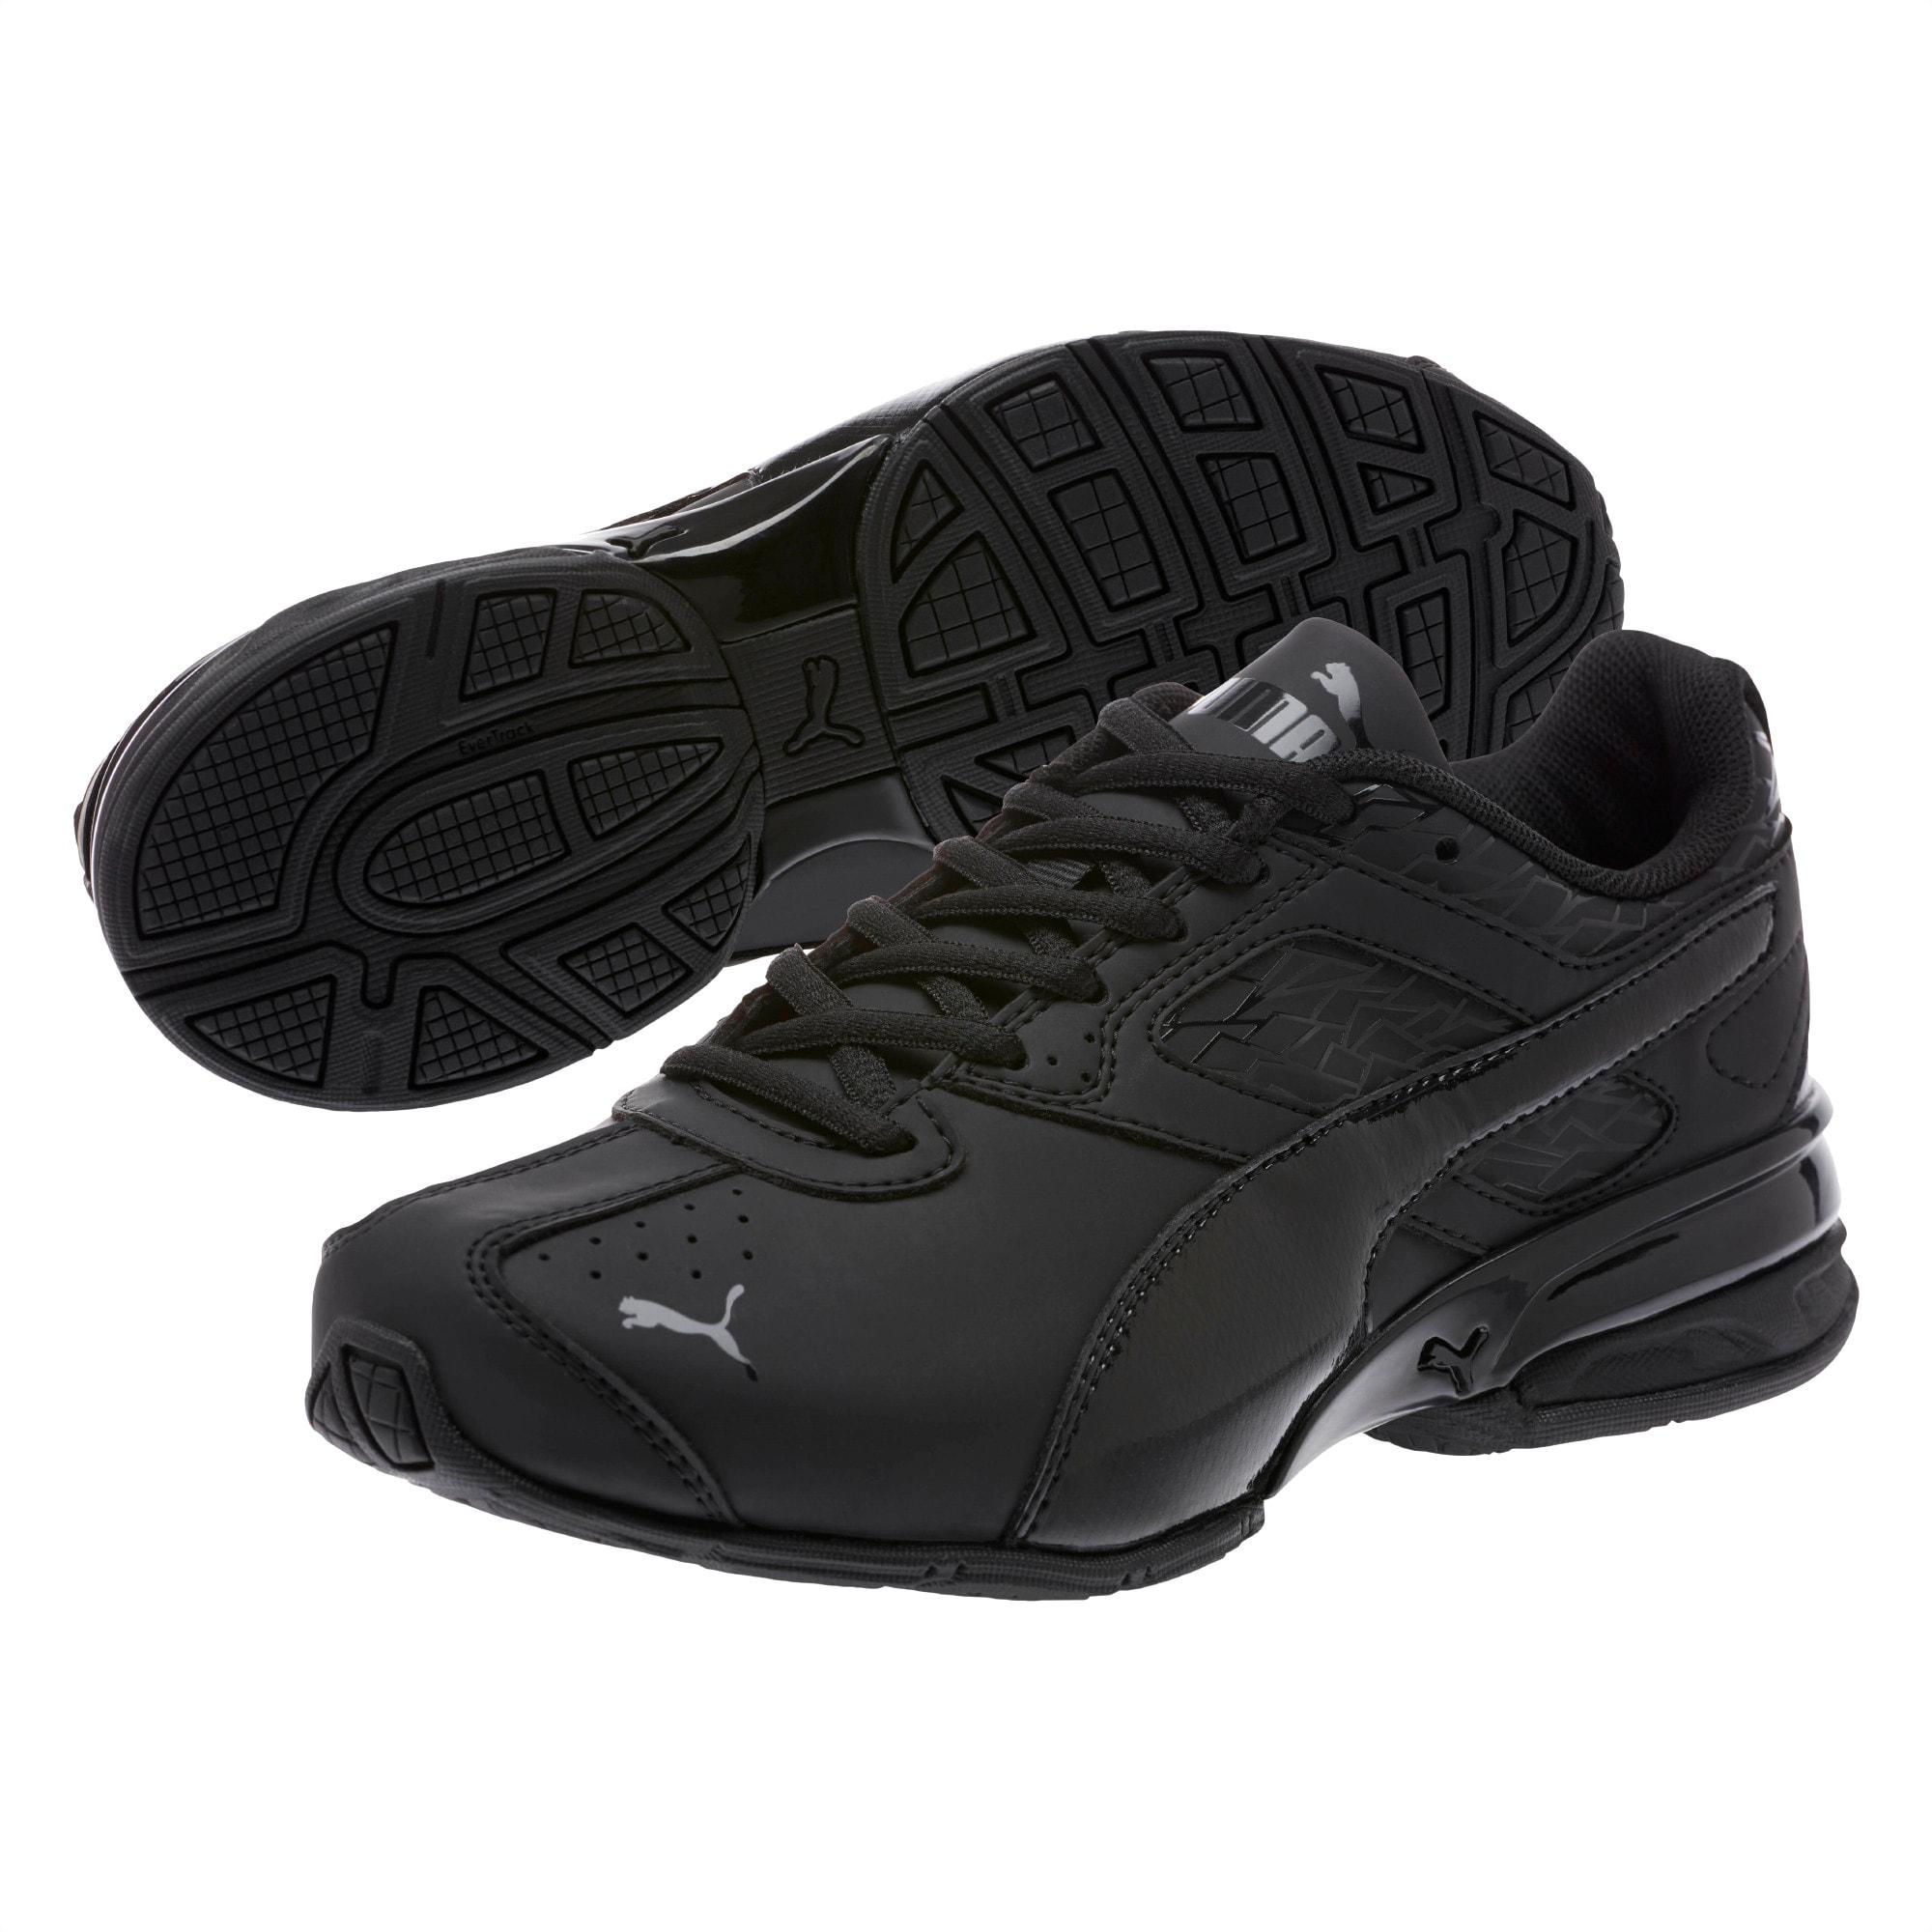 Tazon 6 Fracture FM Sneakers JR